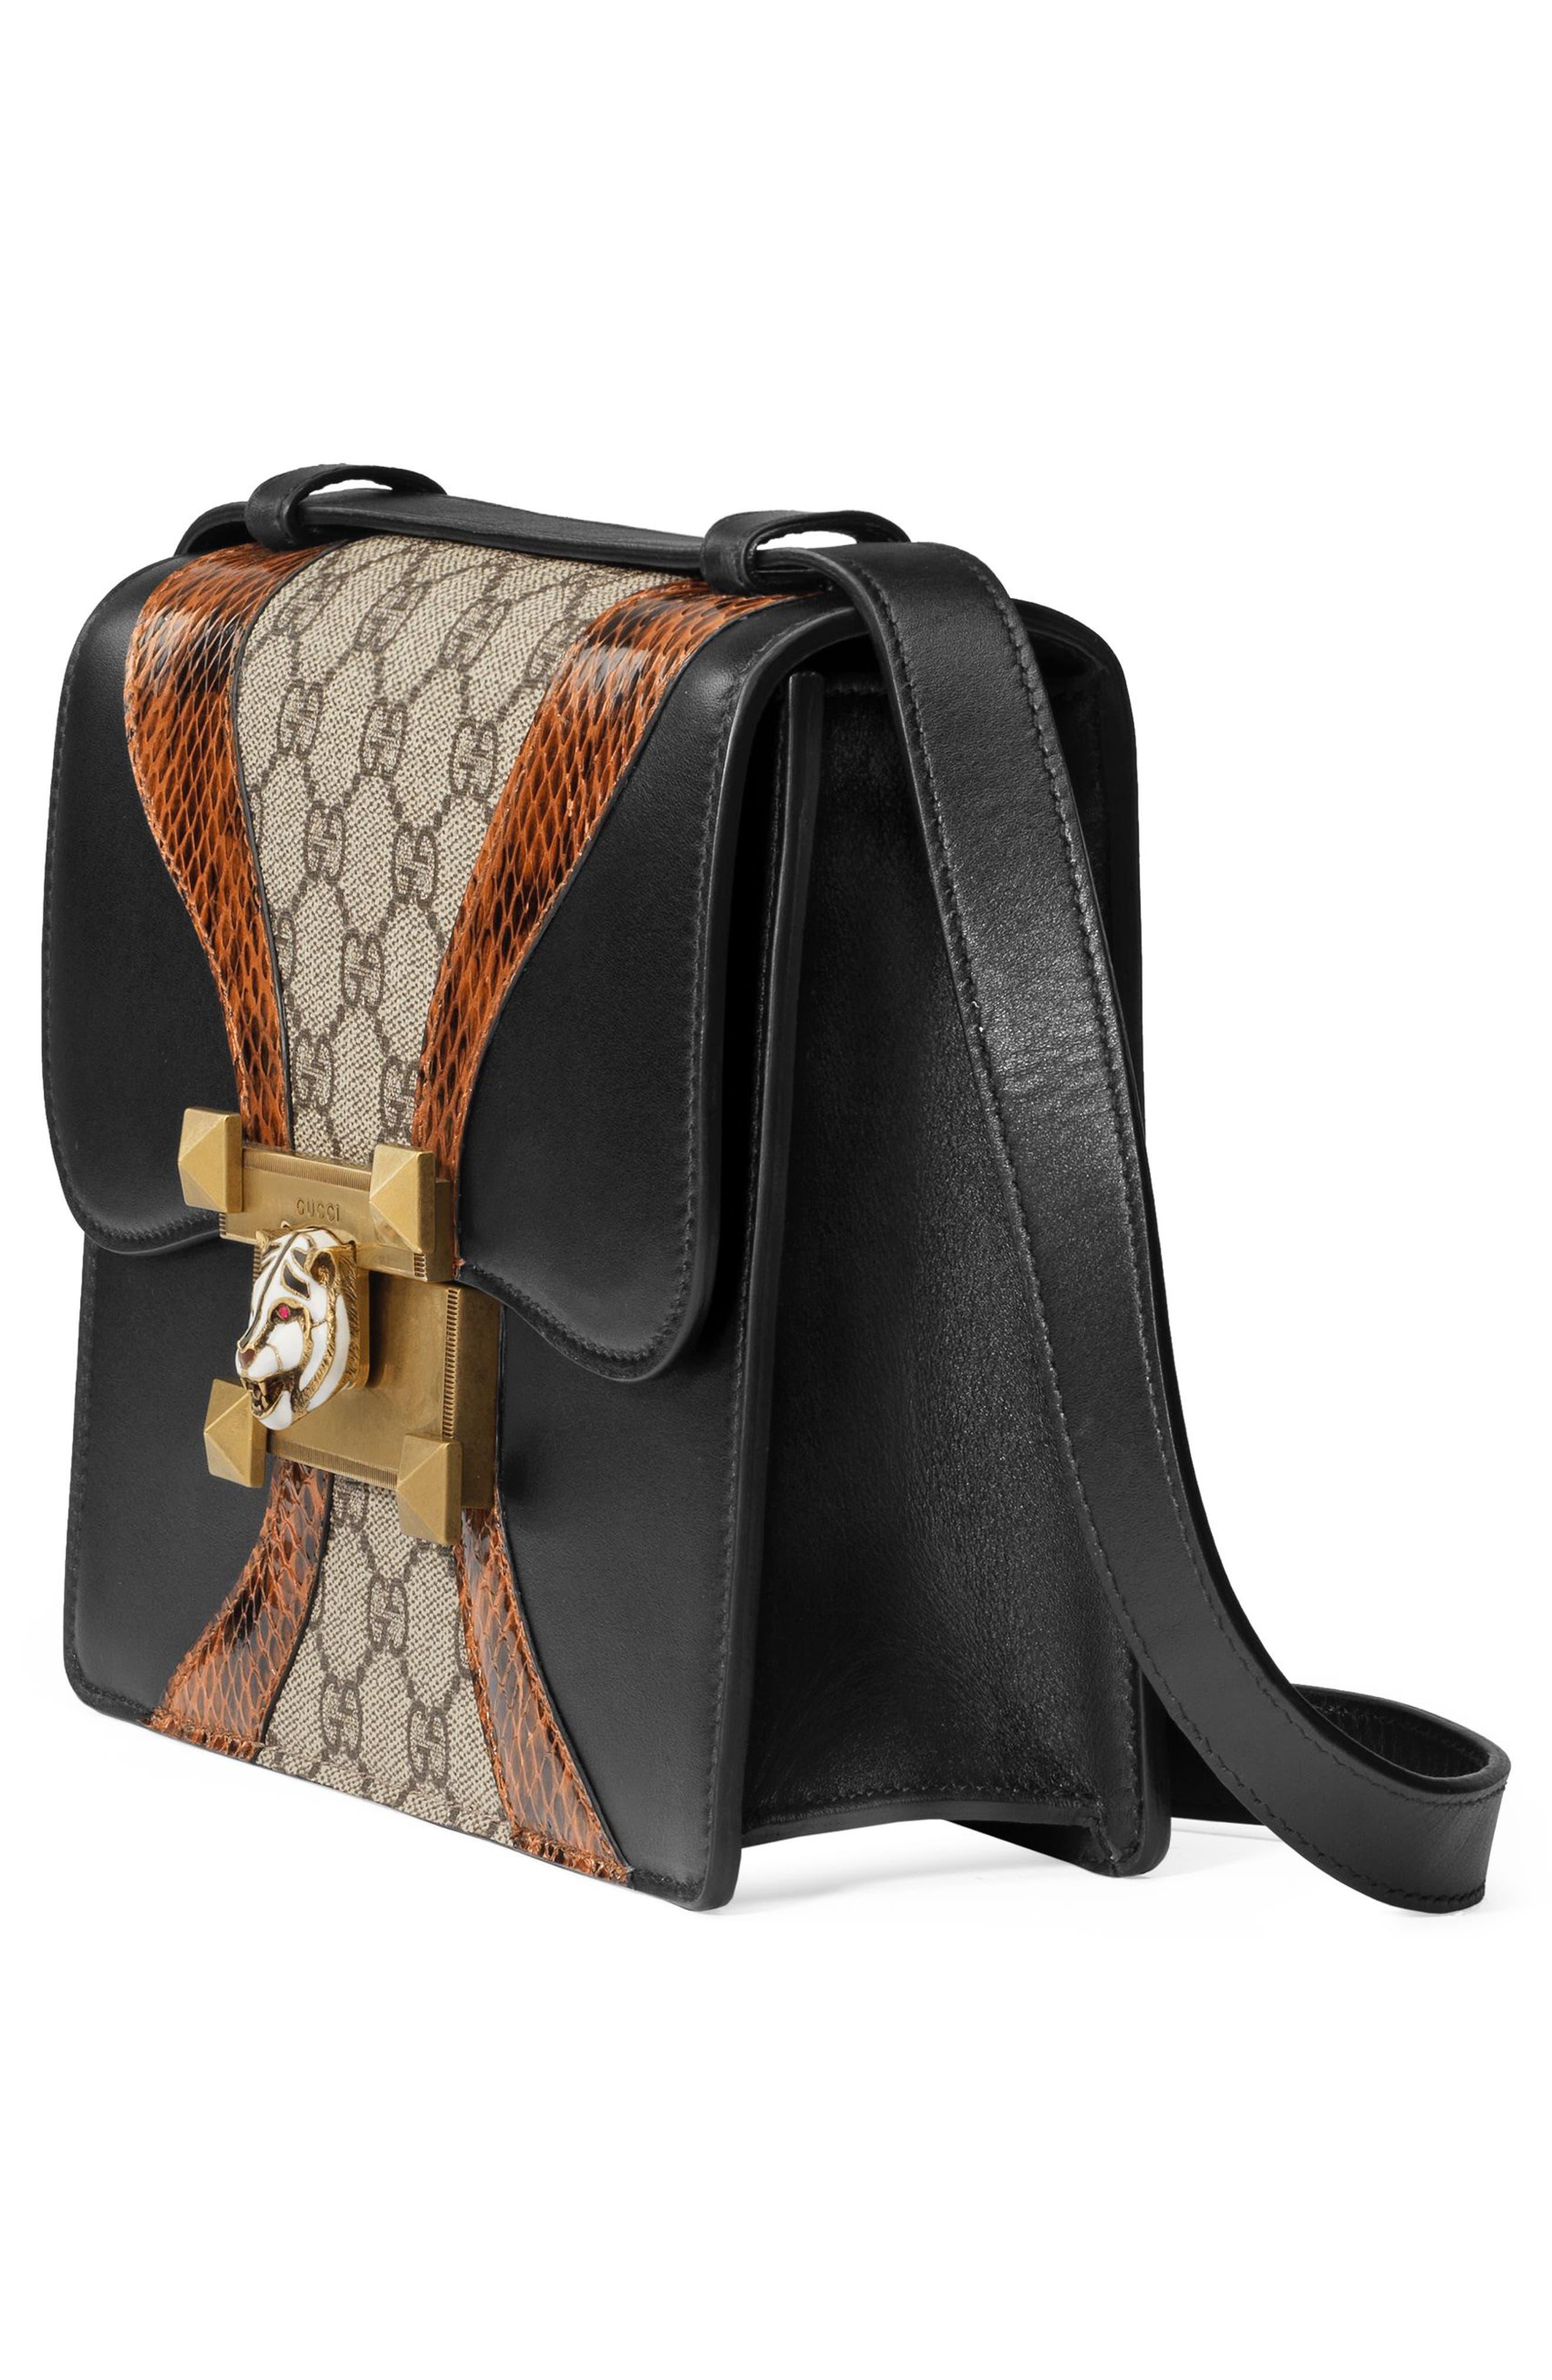 Osiride Genuine Snakeskin & GG Supreme Shoulder Bag,                             Alternate thumbnail 4, color,                             Nero/ Cuir/ Beige Ebony/ Ruby